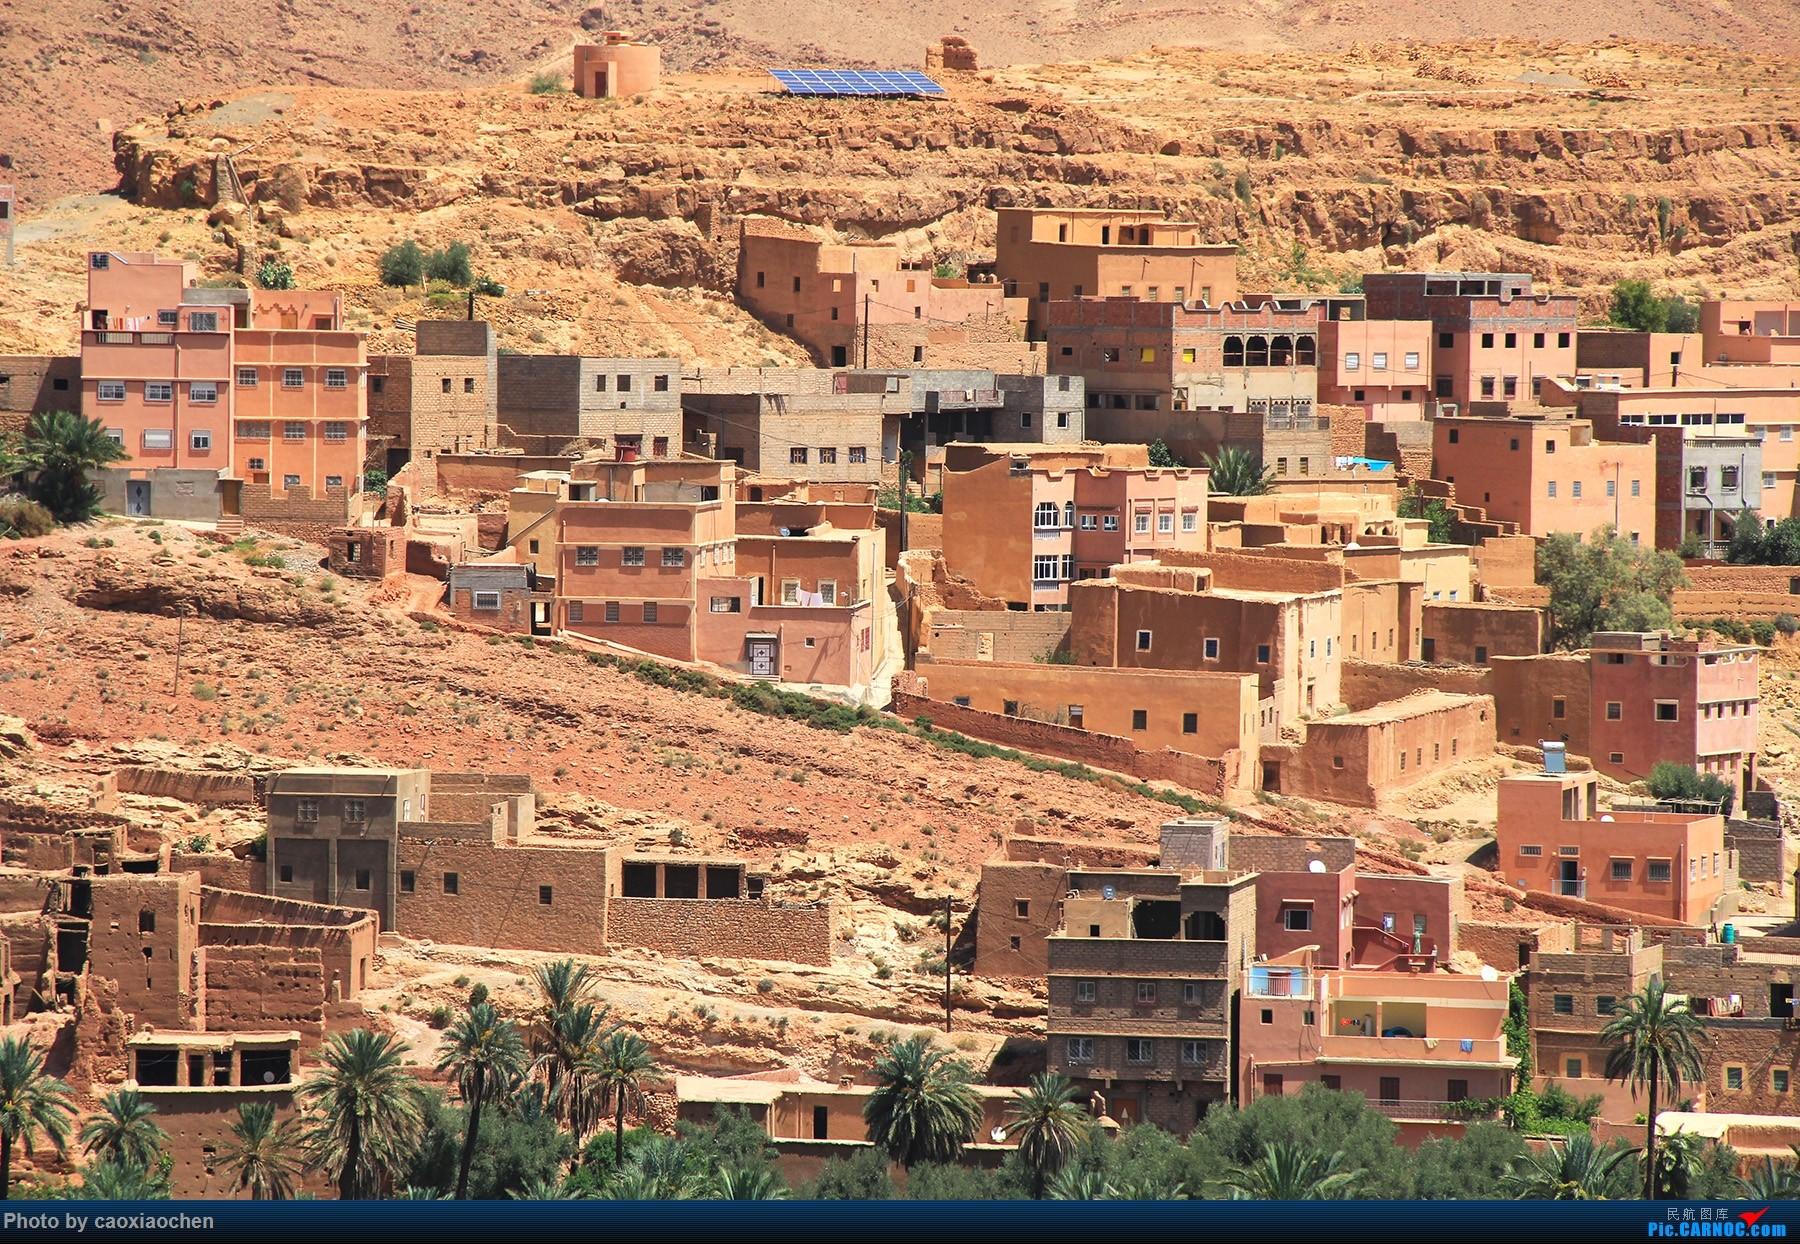 Re:[原创]姗姗来迟的【摩洛哥游记】(2018.8) | 一半沙漠一半海洋的国度 | 全程QR | 航班延误取消 | 意外收获的多哈一日游